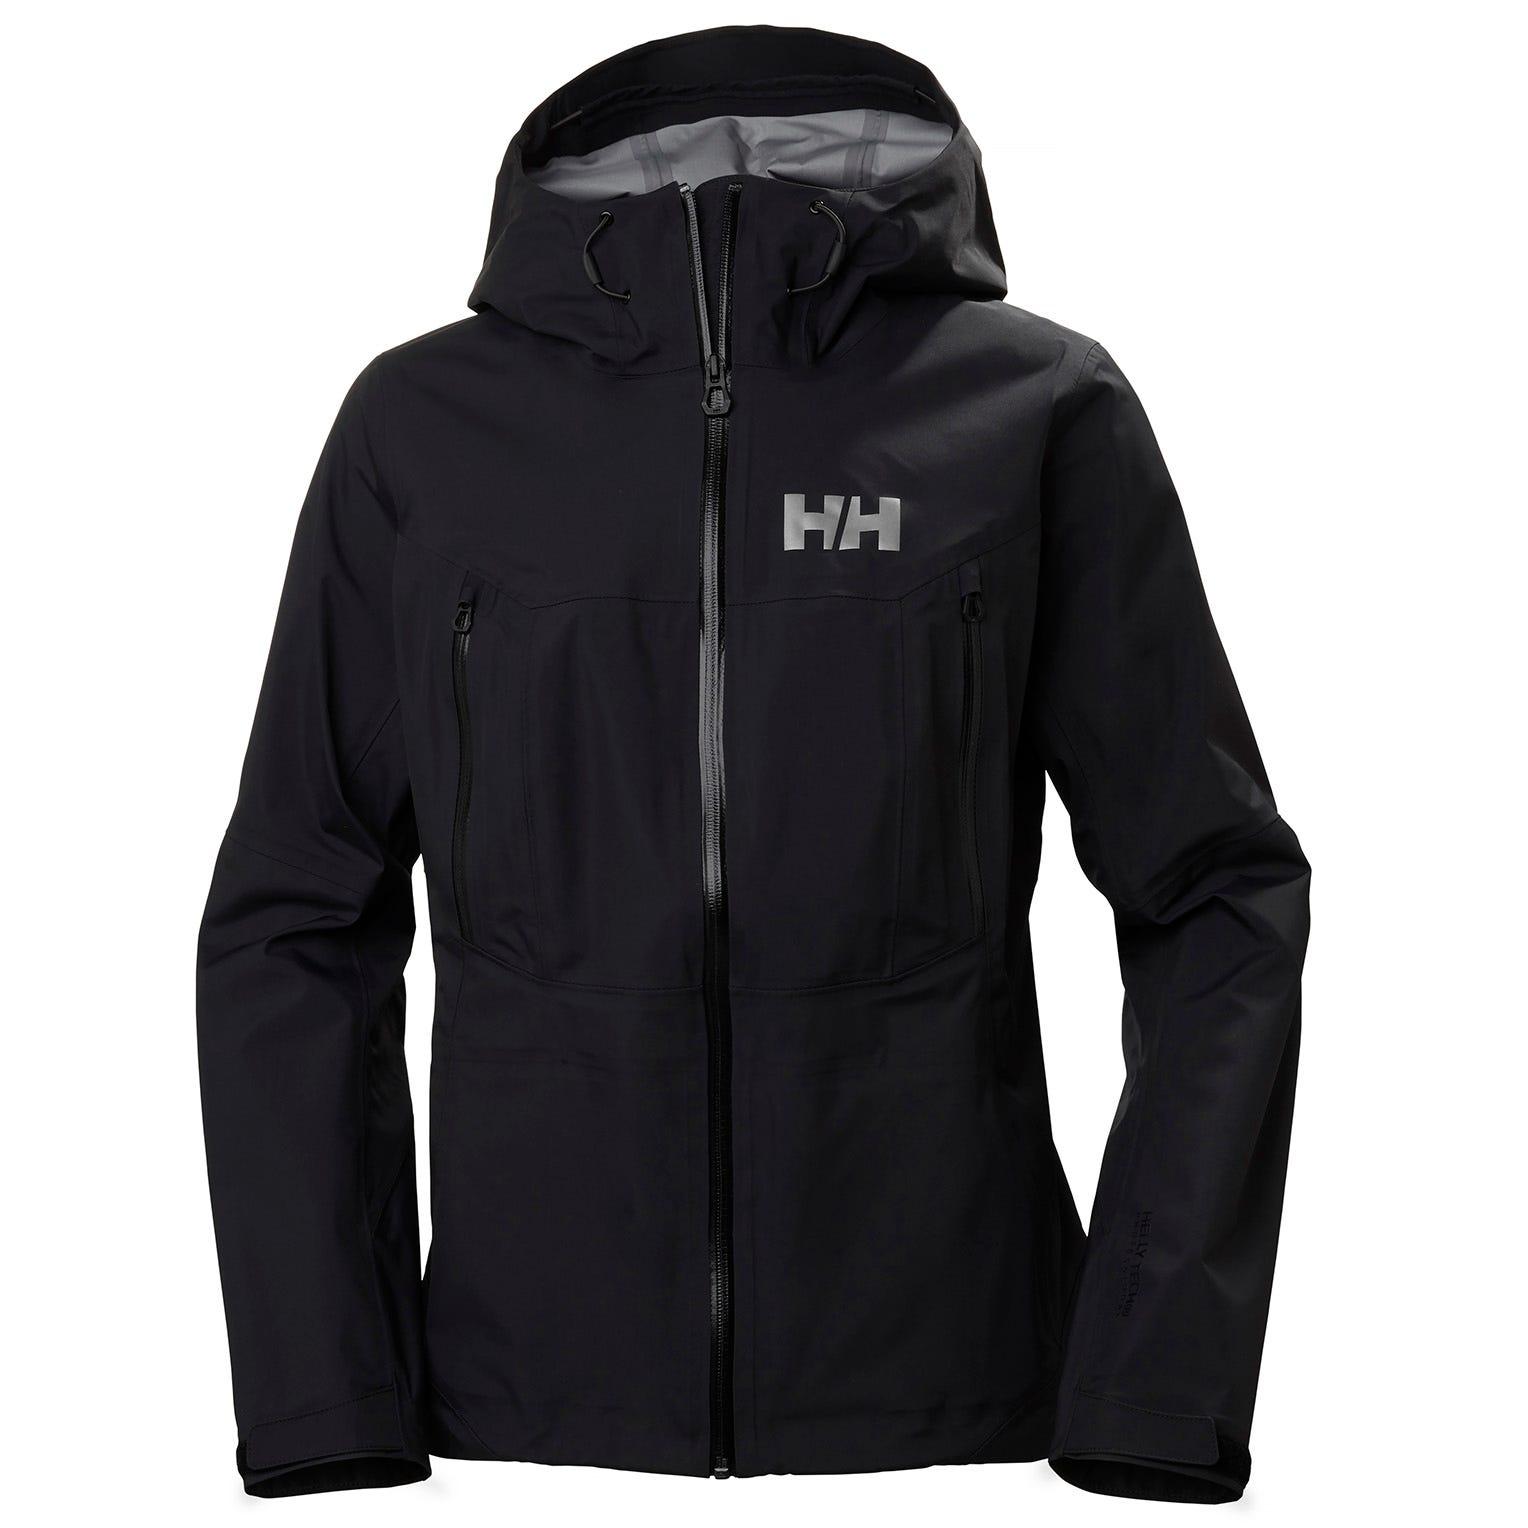 Helly Hansen W Verglas 3l Shell Jacket Womens Hiking Black M